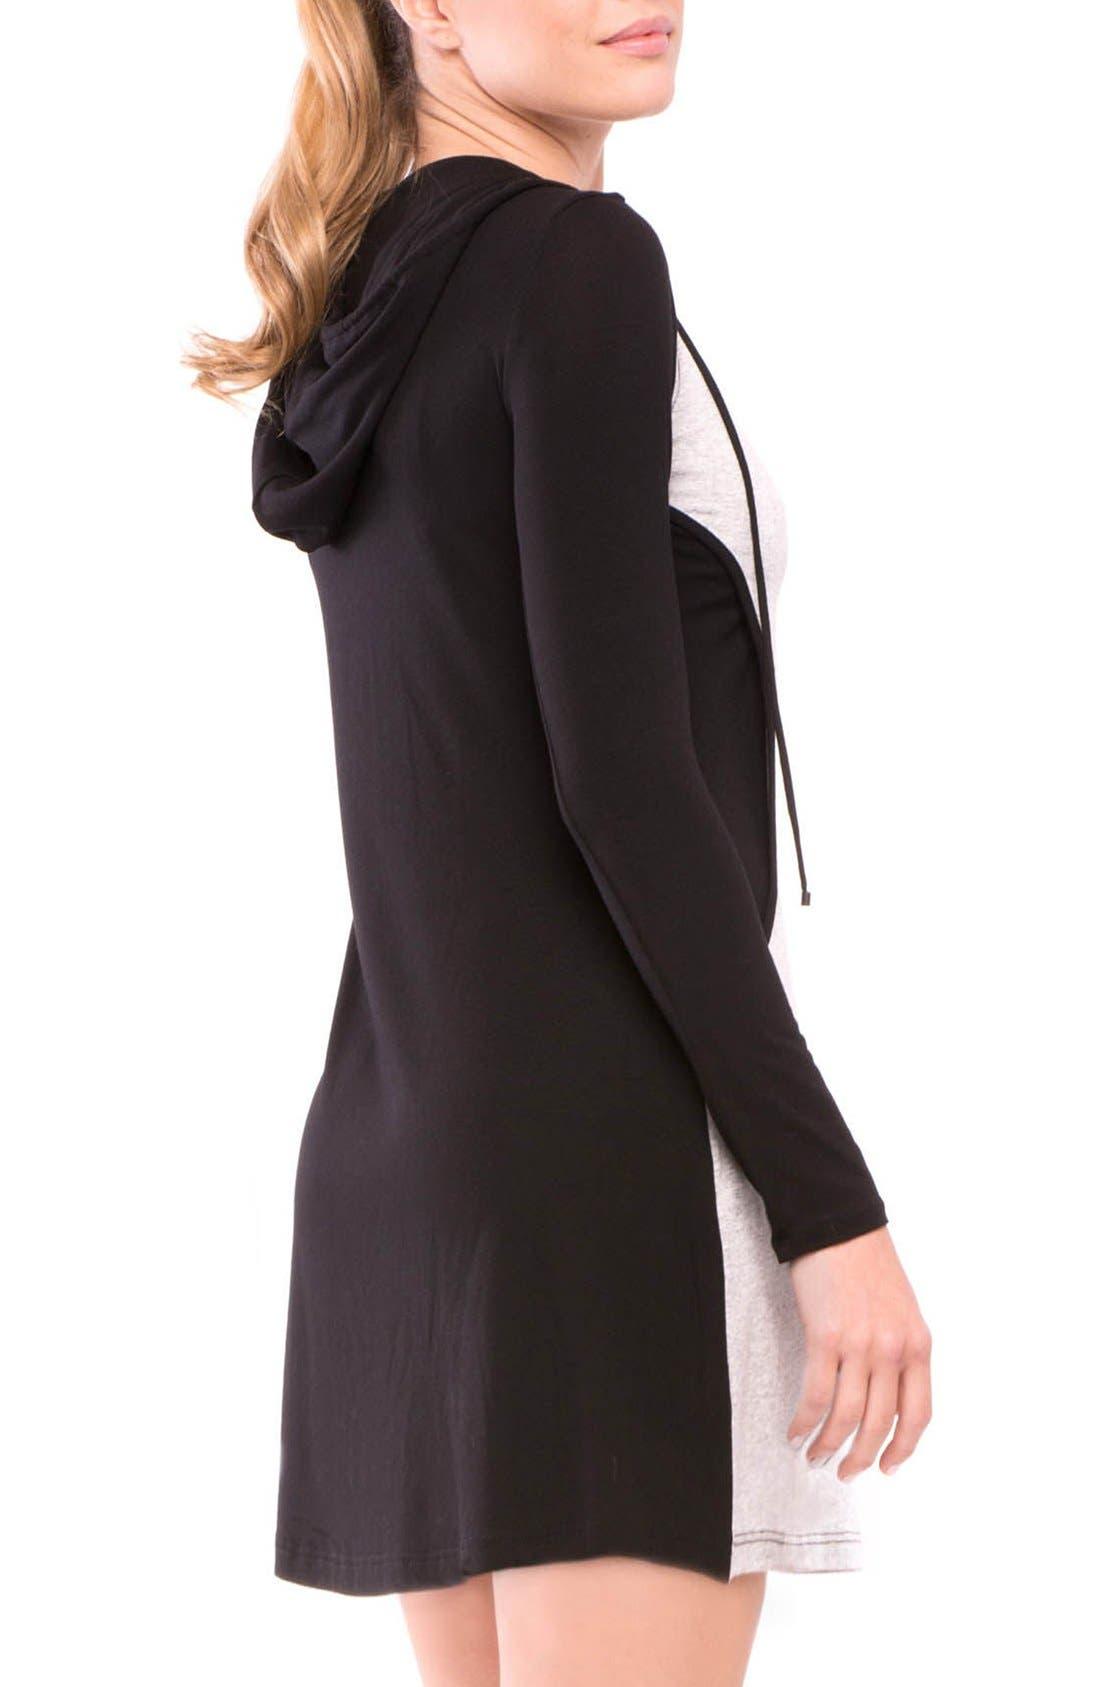 Skye Maternity/Nursing Hooded Tunic,                             Alternate thumbnail 6, color,                             GRAY/ BLACK STRIPE